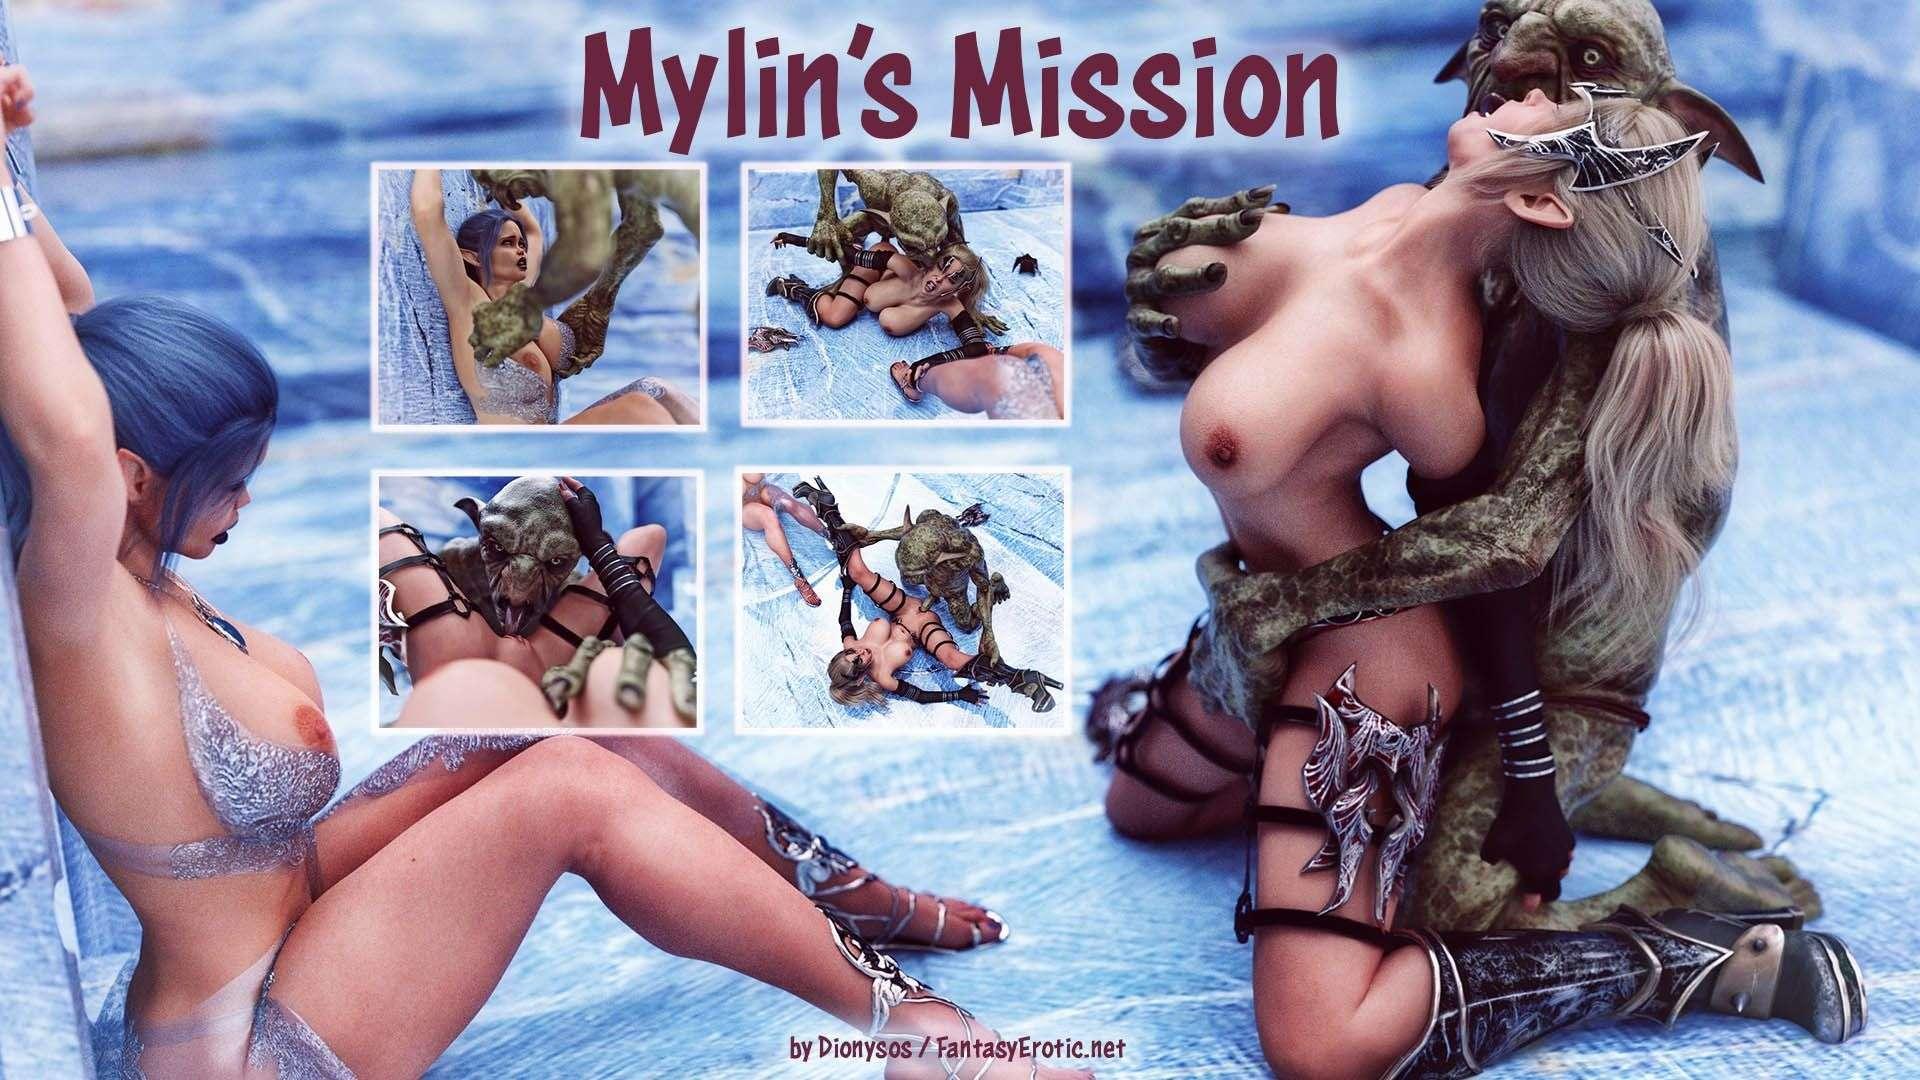 MylinsMission-Promo